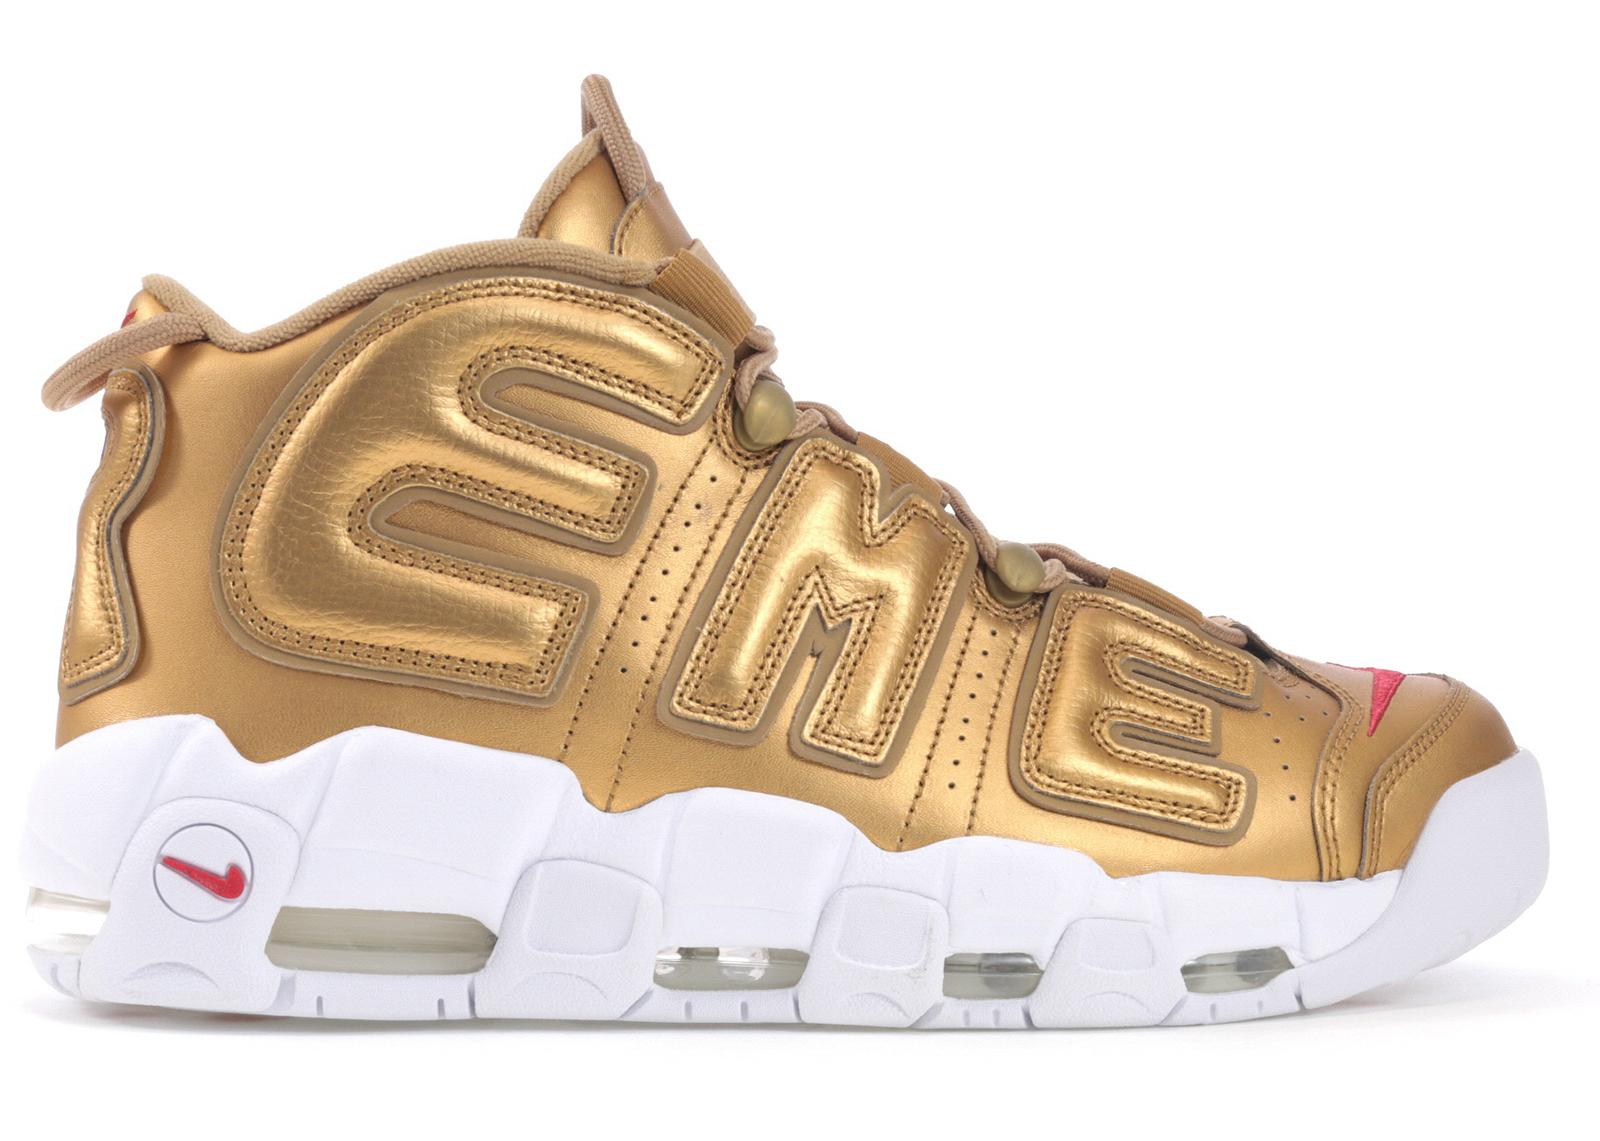 Nike Sneakers Koop Deadstock Shoes Basketball OwfA7dq4